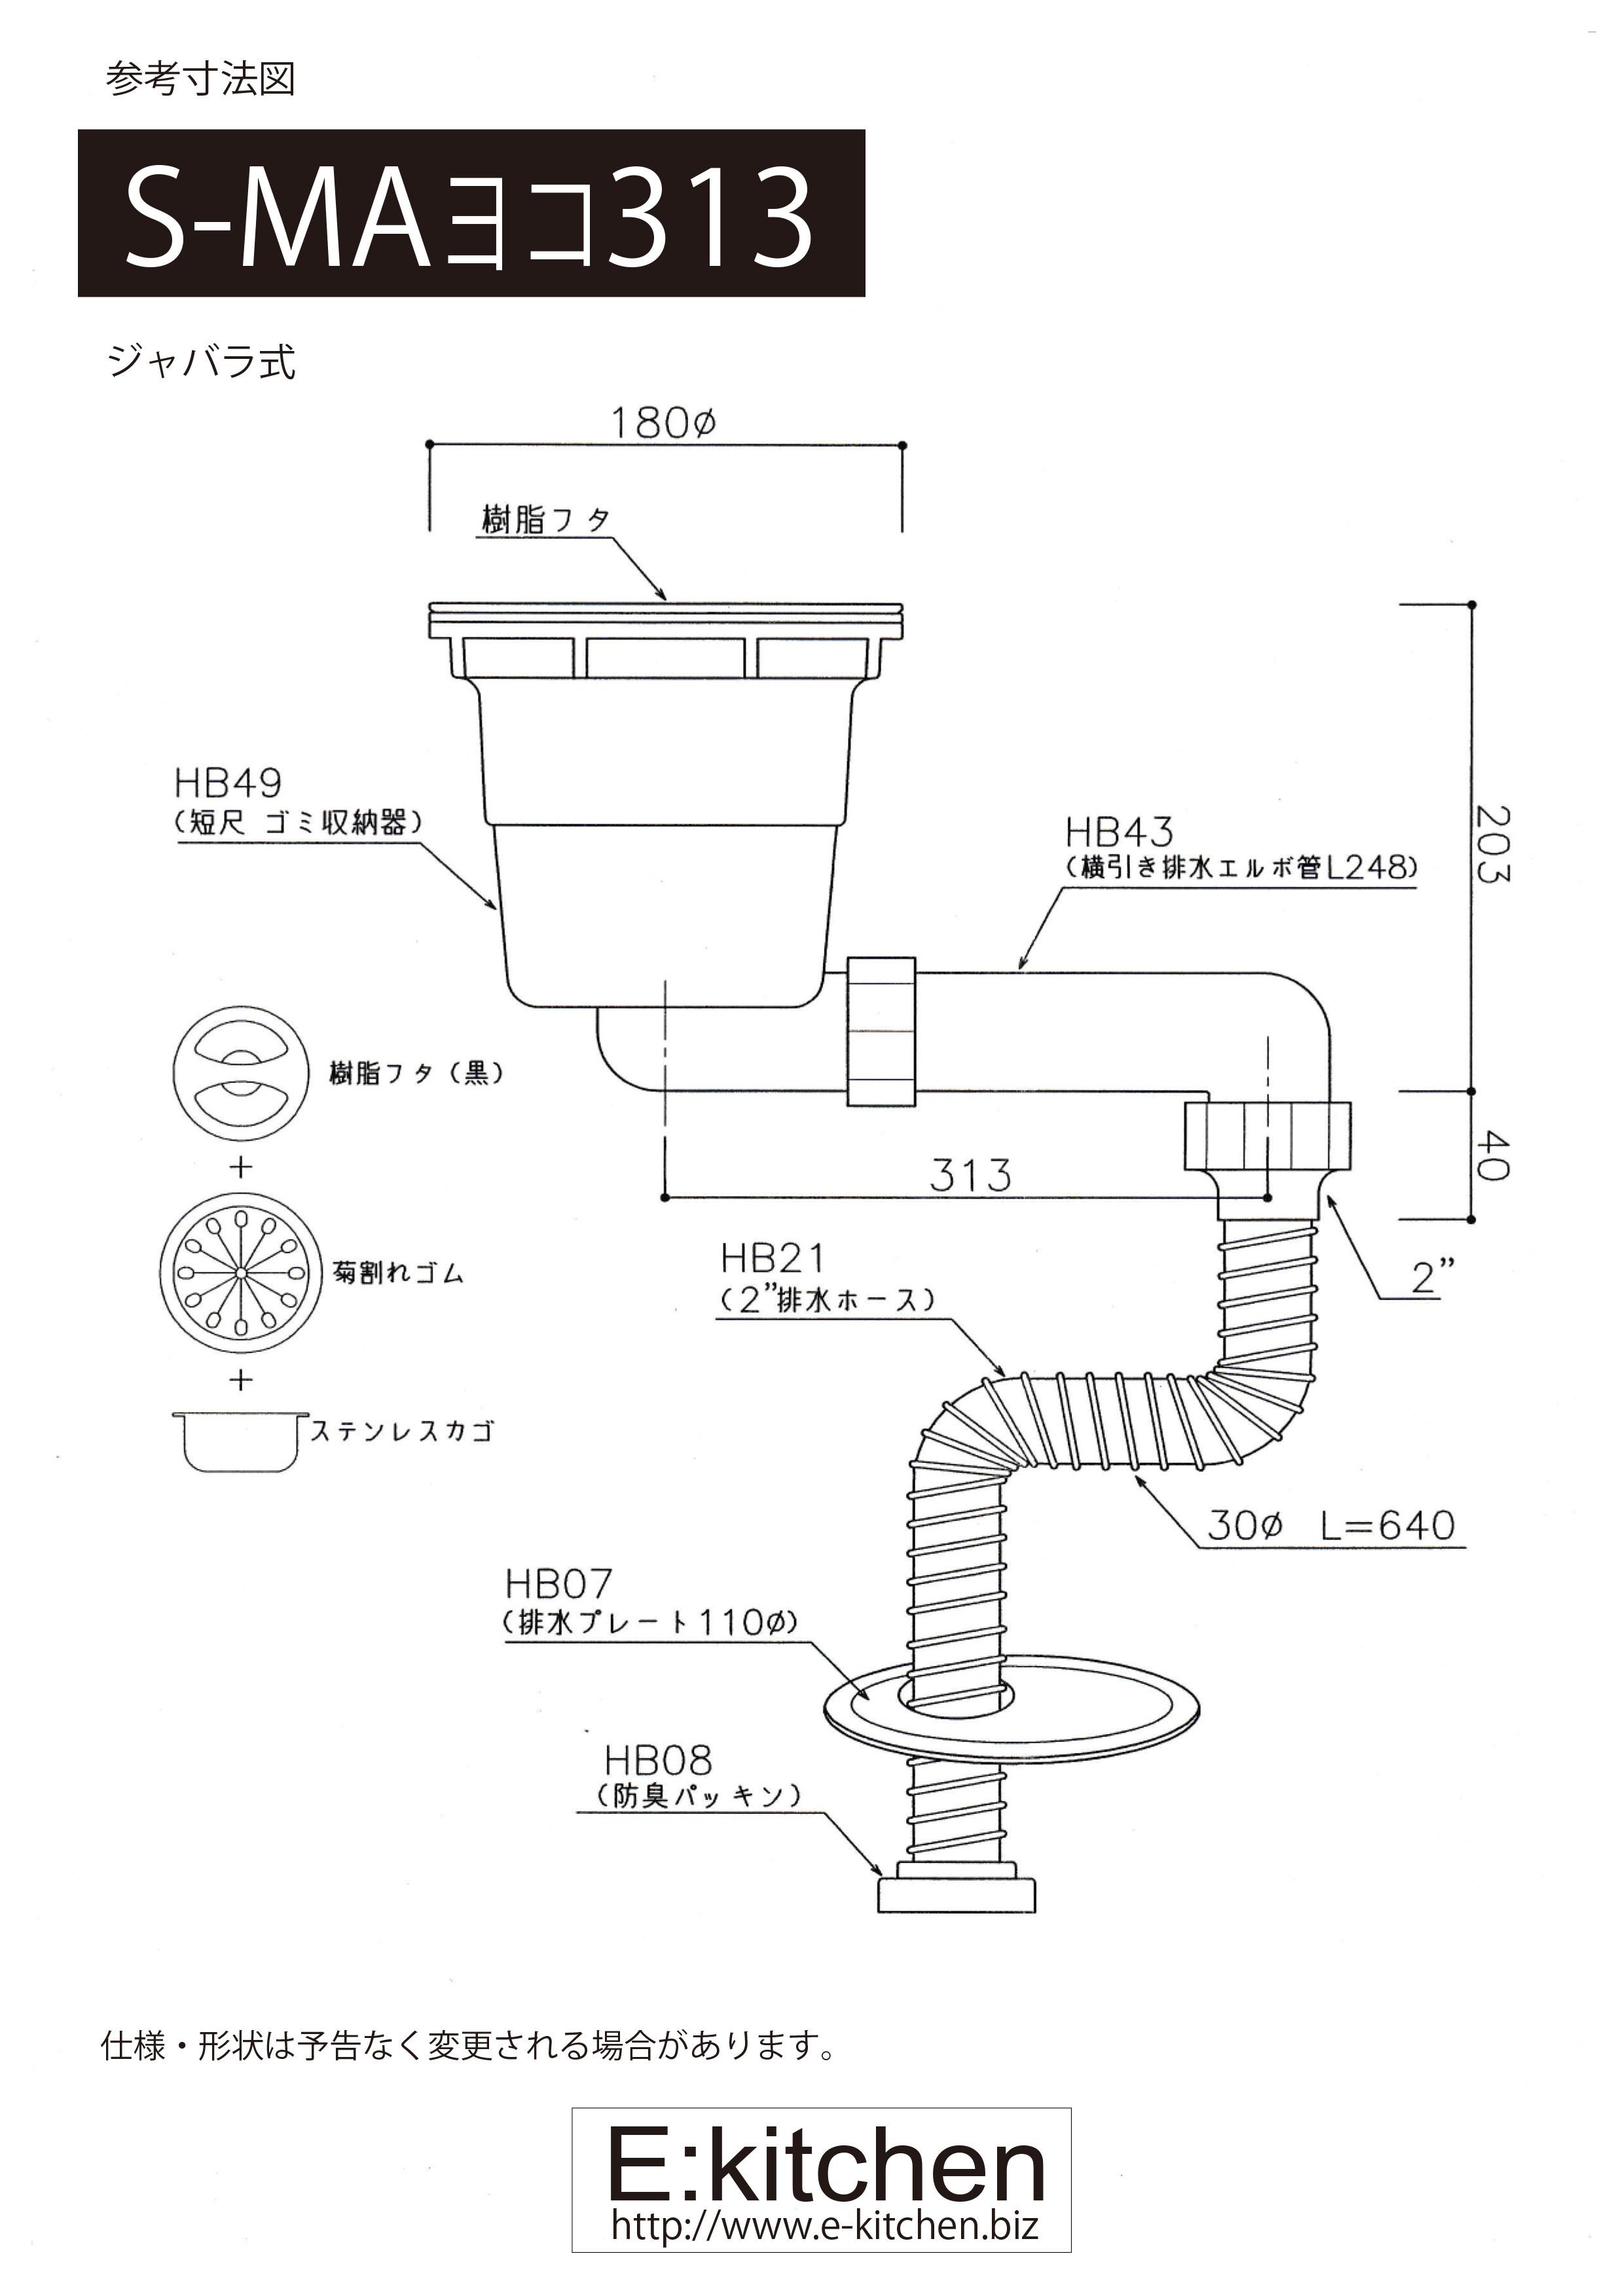 CKシリーズ 短尺排水部品S-MAヨコ313